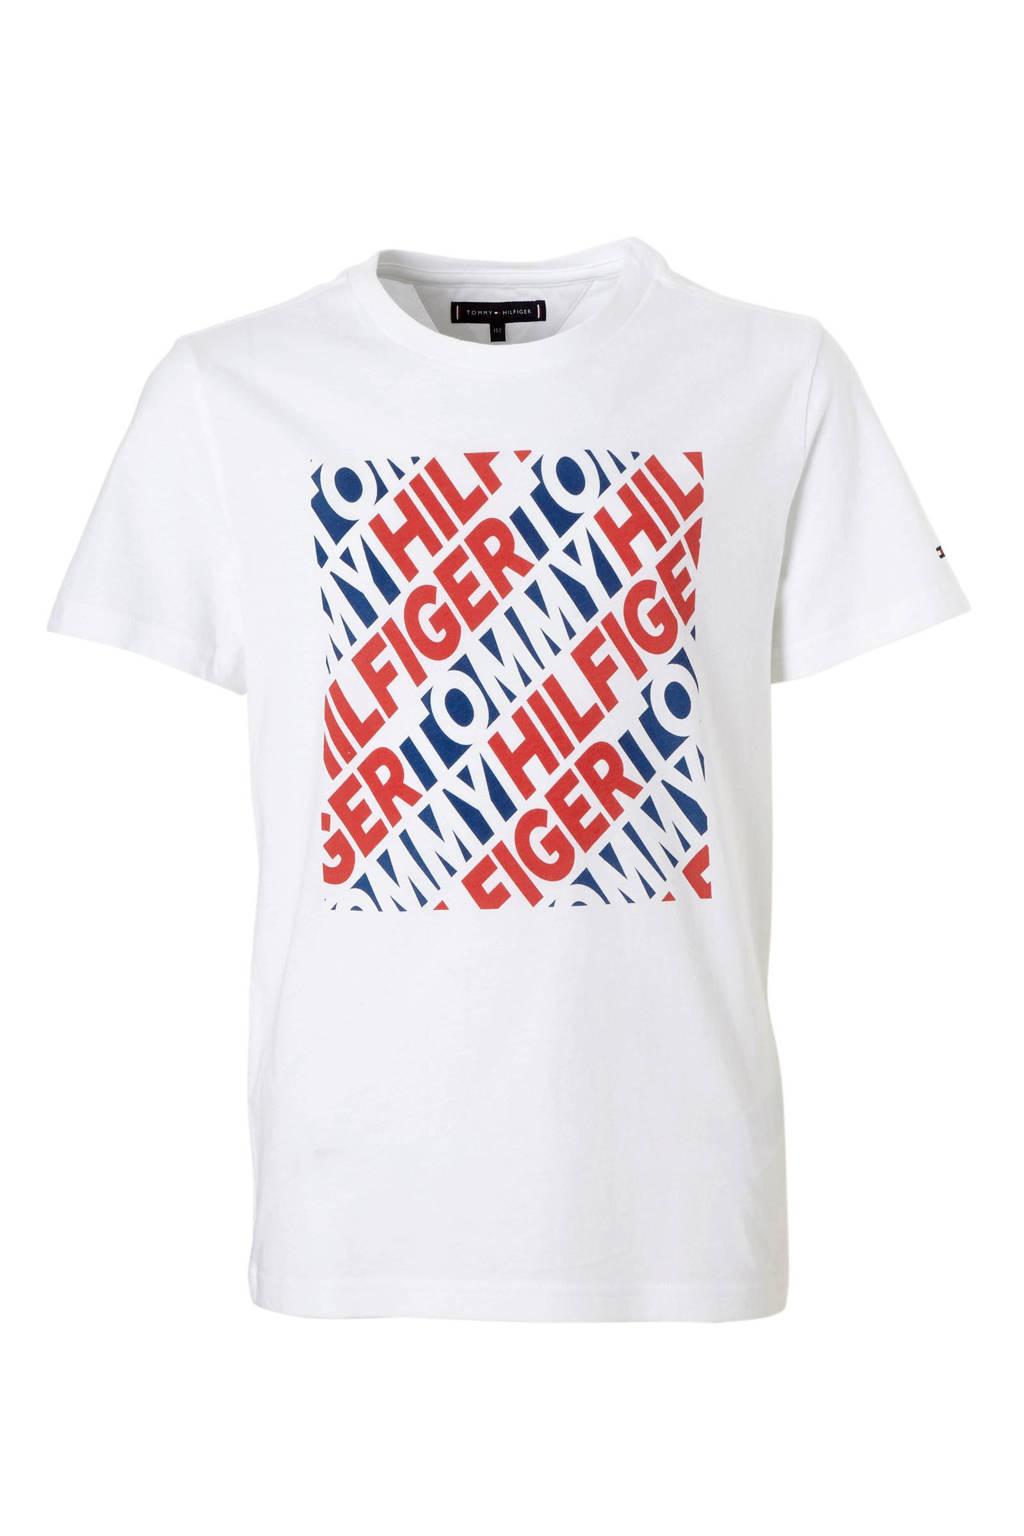 Tommy Hilfiger T-shirt met print wit, Wit